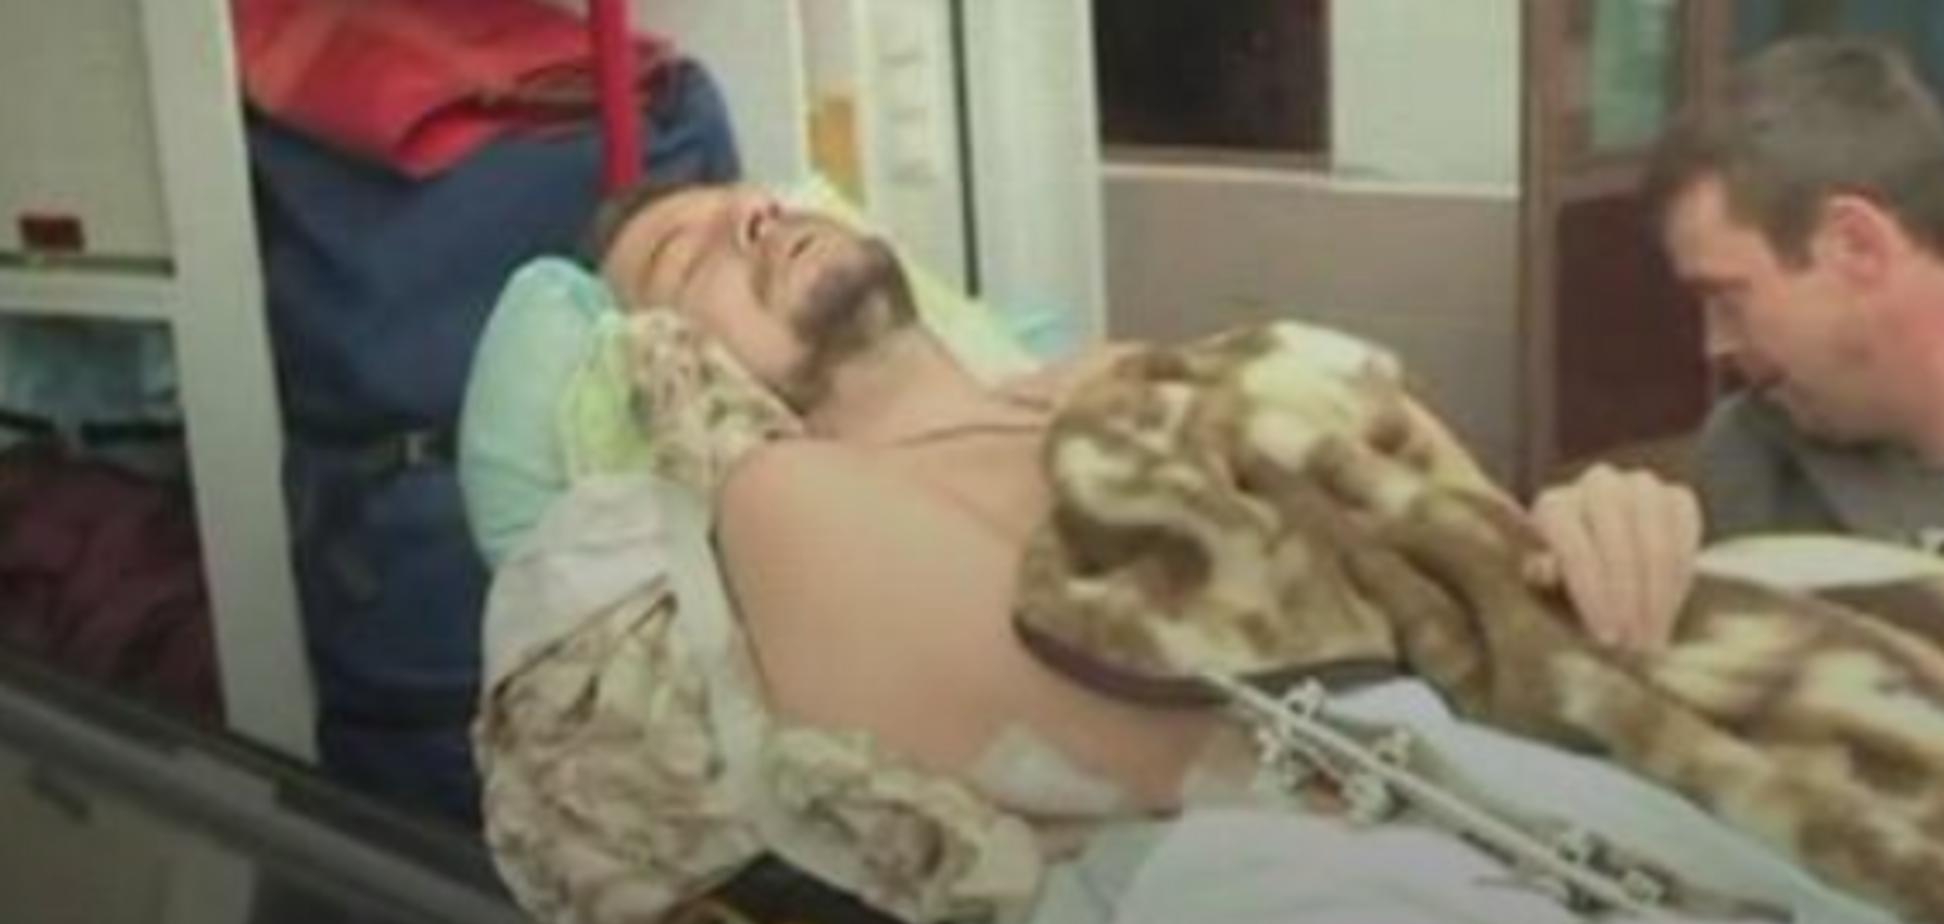 Теракт у Києві: нардепа перевели в секретну лікарню